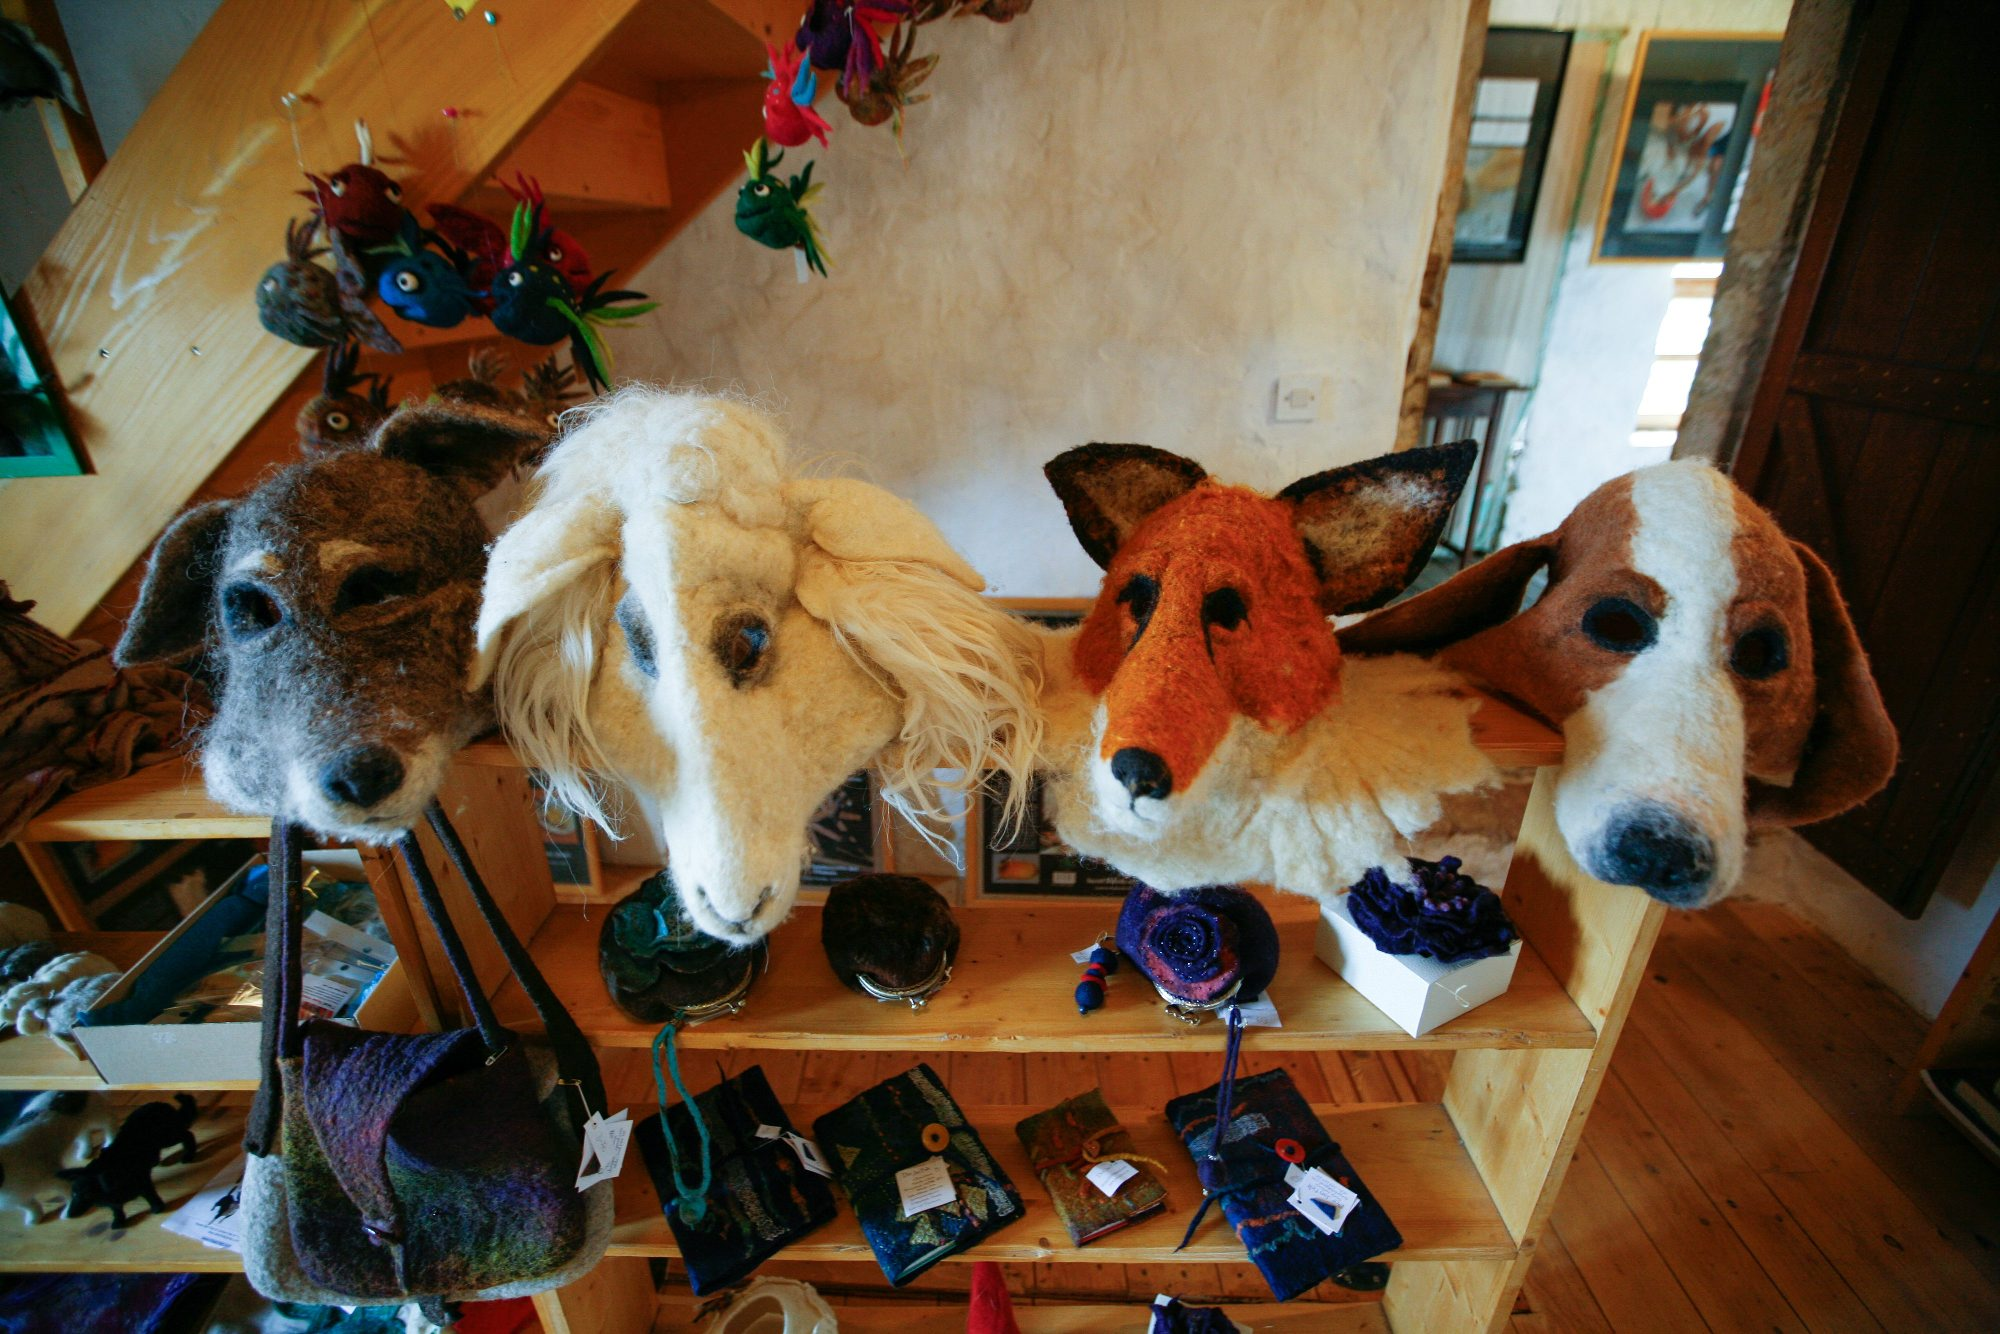 Lubenice, 060718. Muzej Ovcarstva. Tea de Both izradjuje od vune lutke, maske i razne igracke. Na fotografiji: muzej sa proizvodima. Foto: Matija Djanjesic / CROPIX